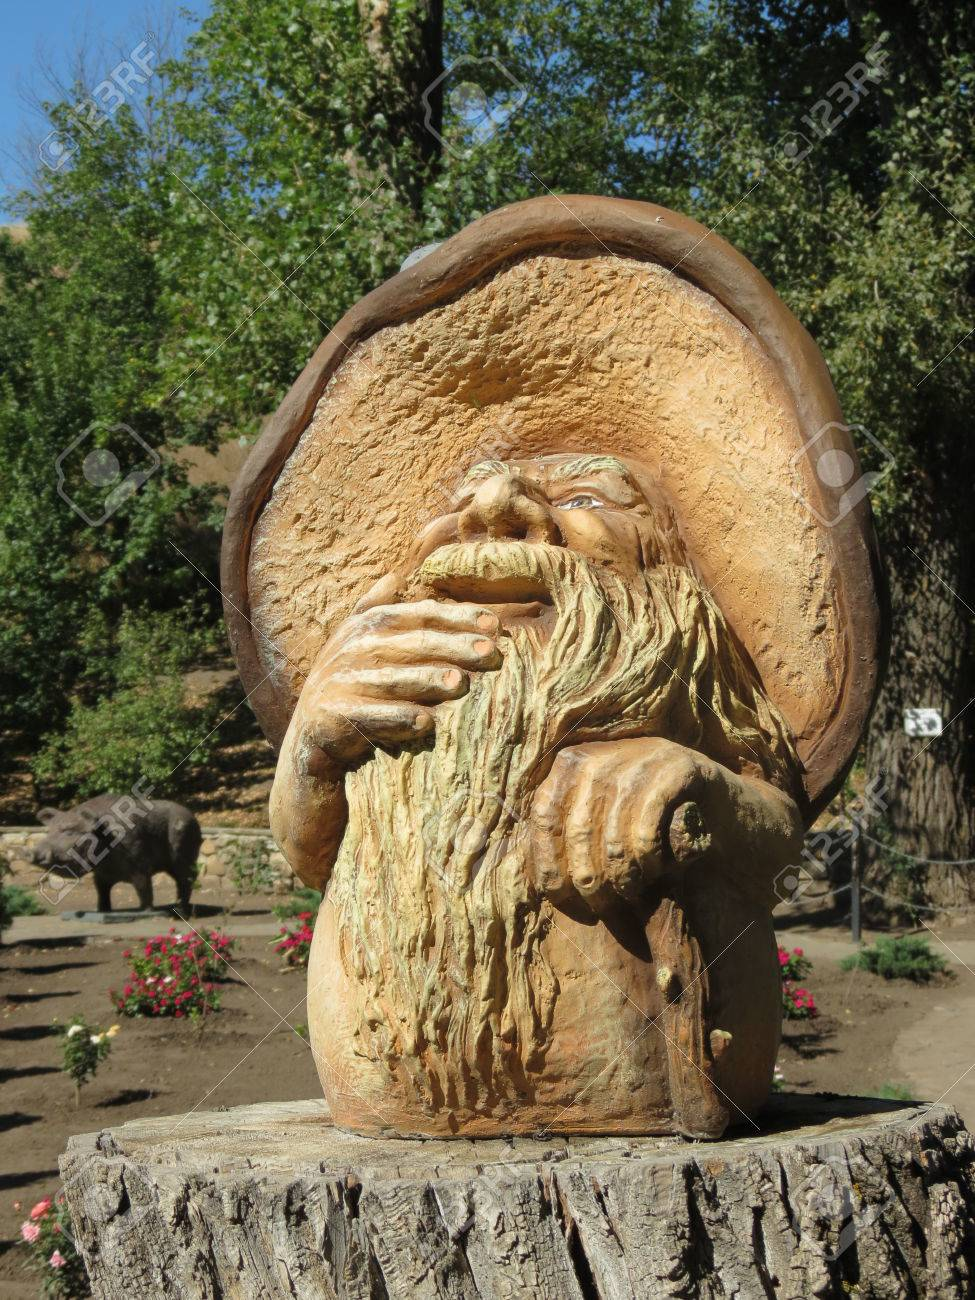 Fantasy creature mushroom sculpture stock photo picture and